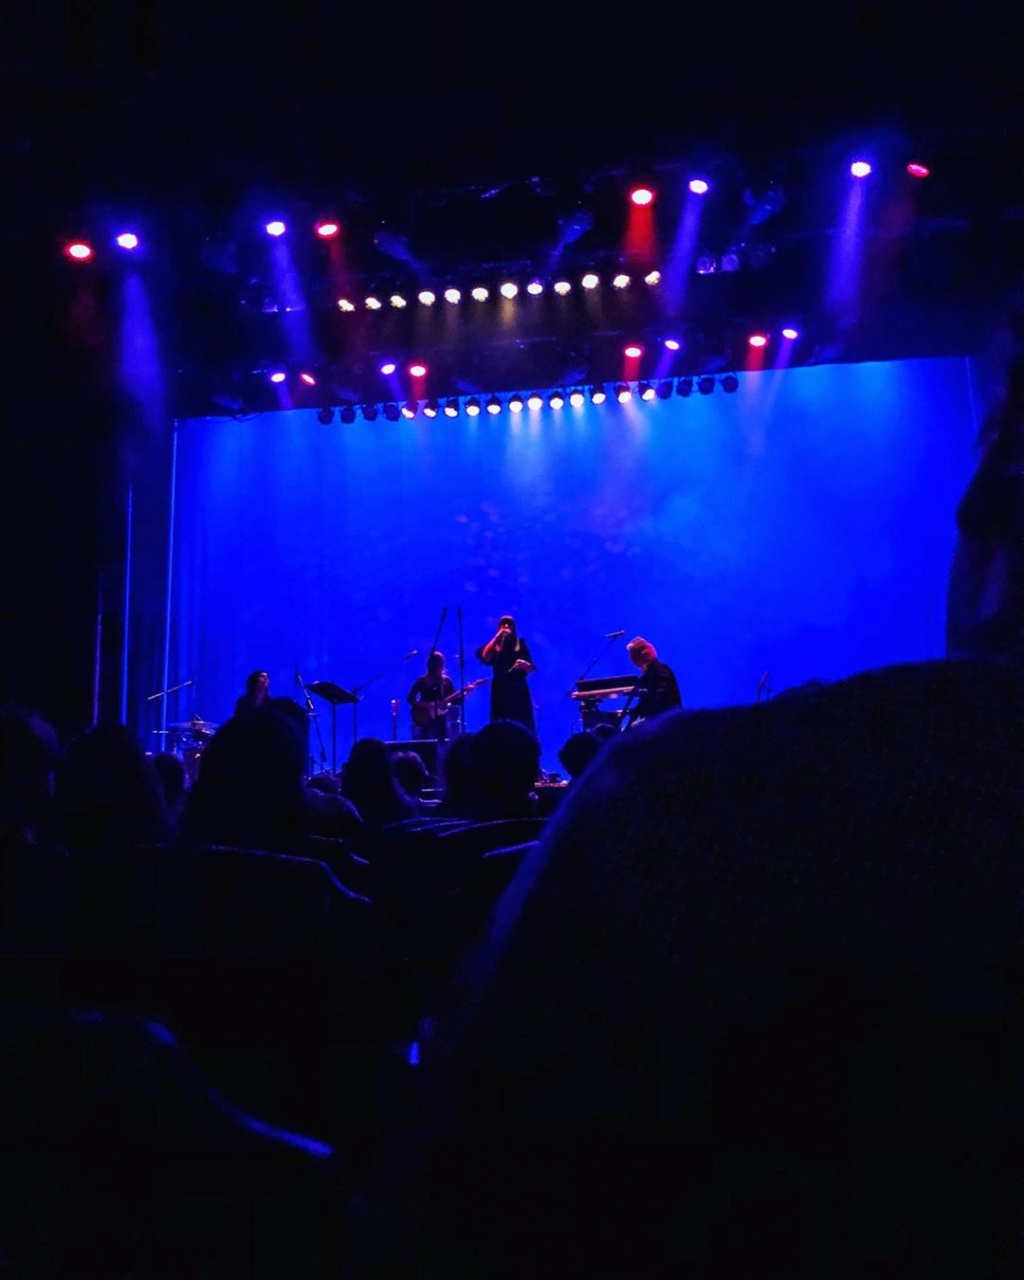 9/25/19 - Washington DC, Lincoln Theater 1198